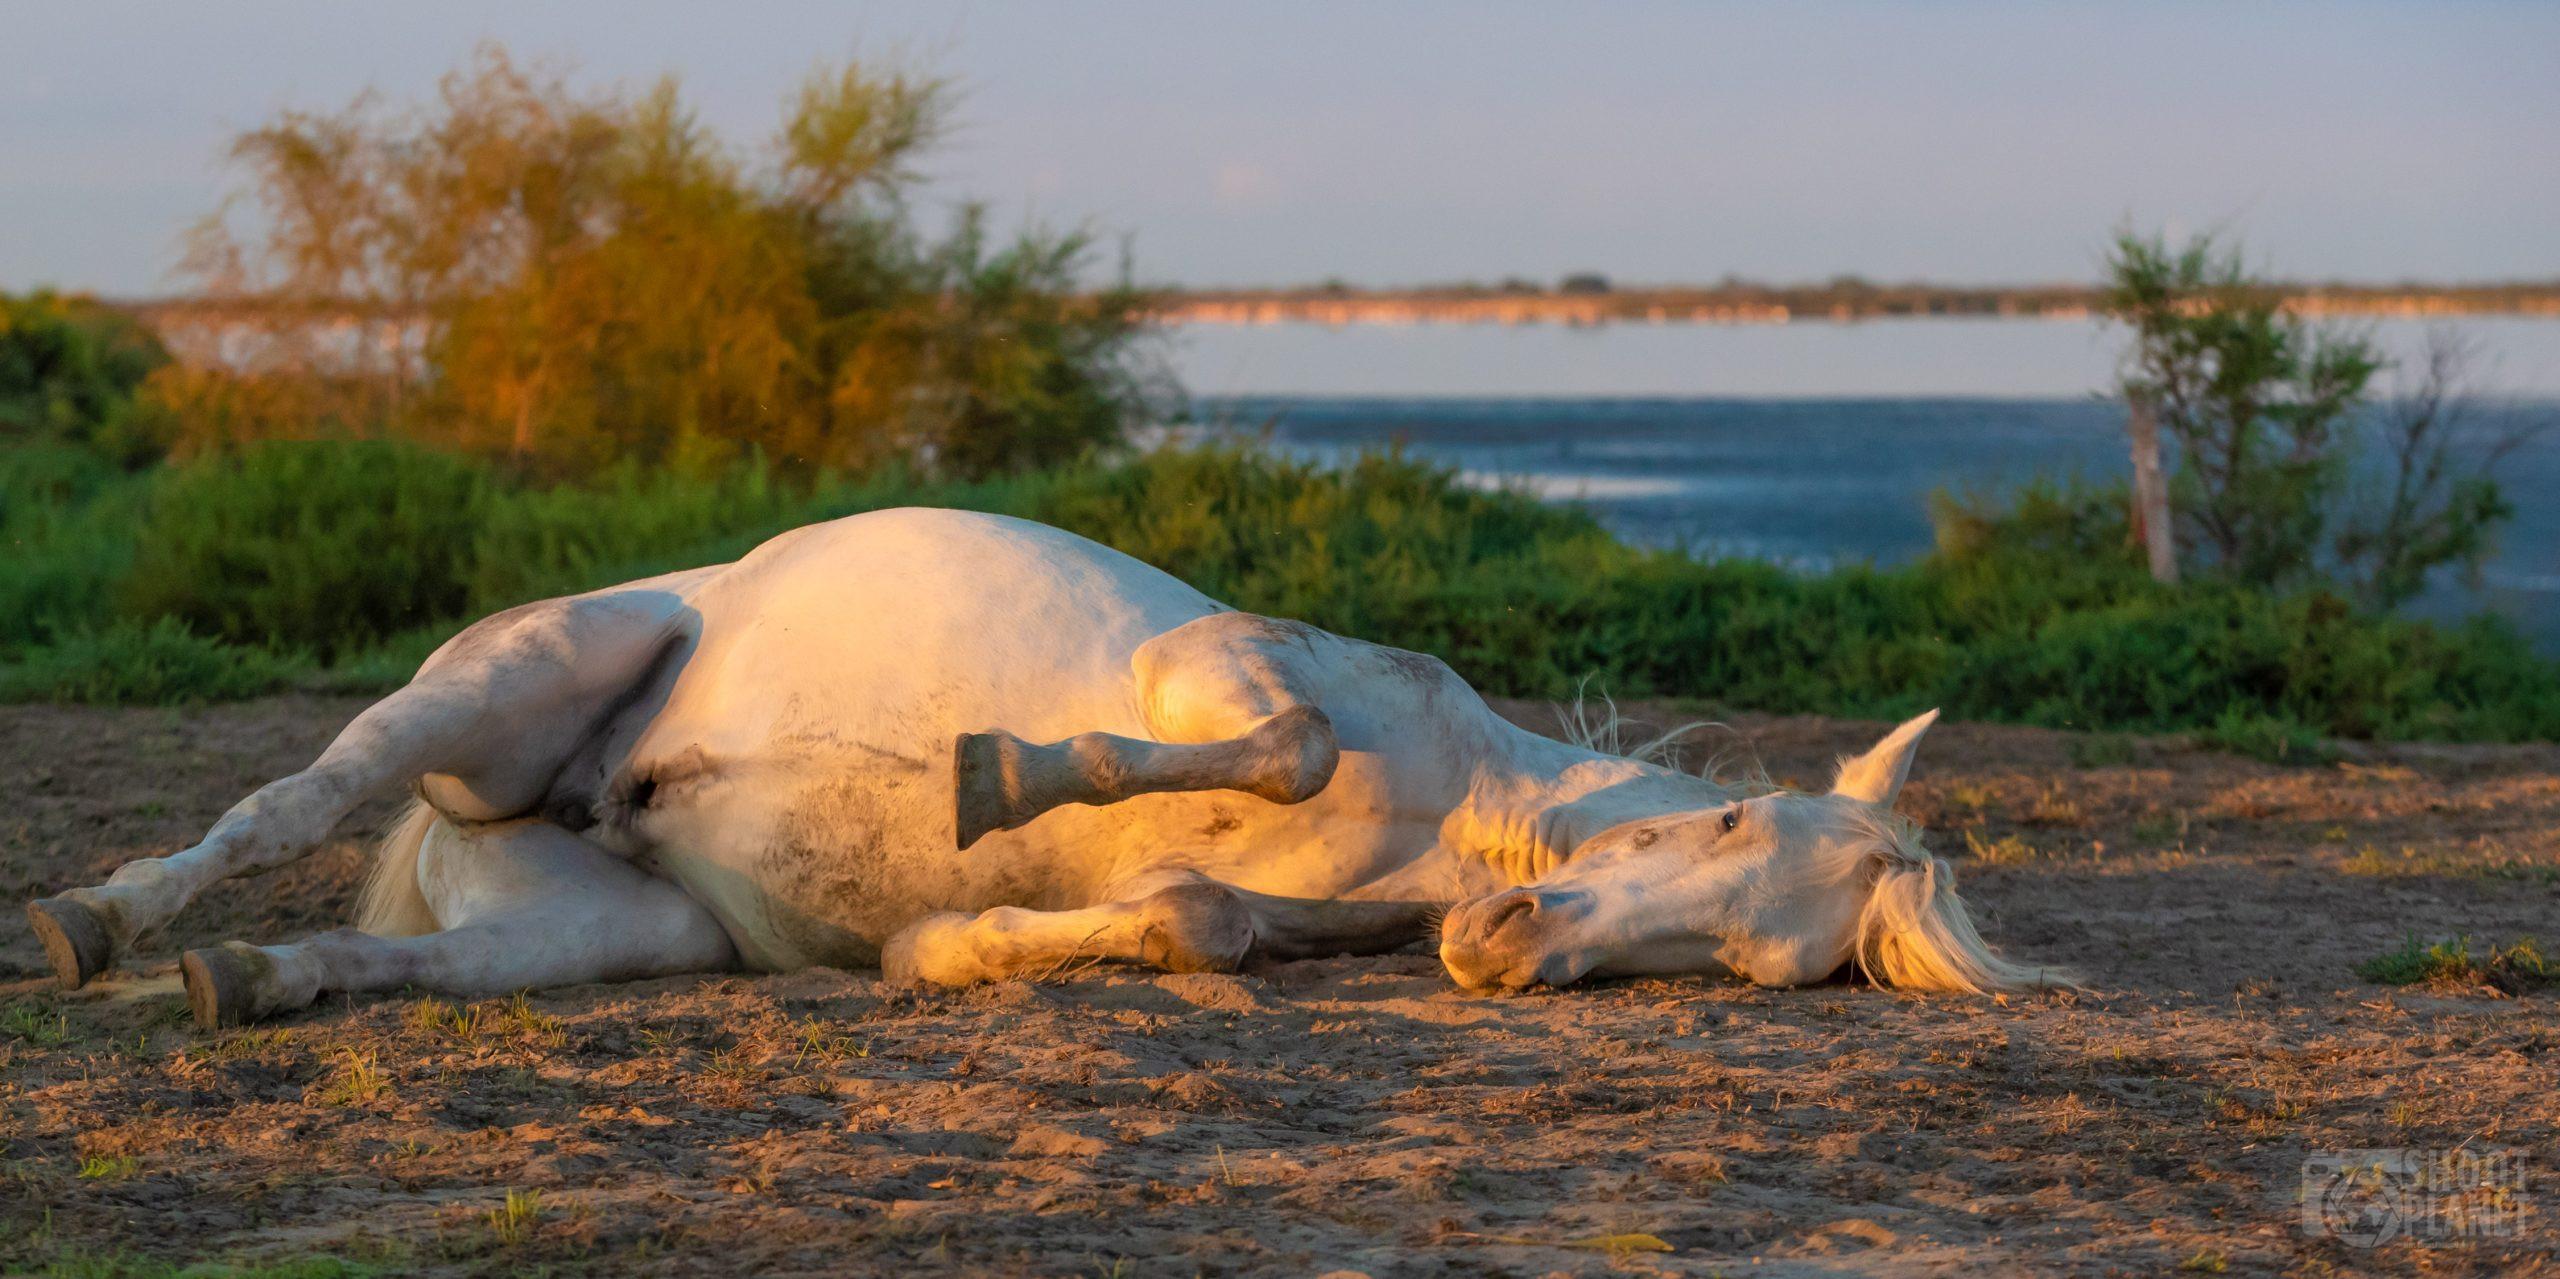 Horse resting near a pond, Camargue France